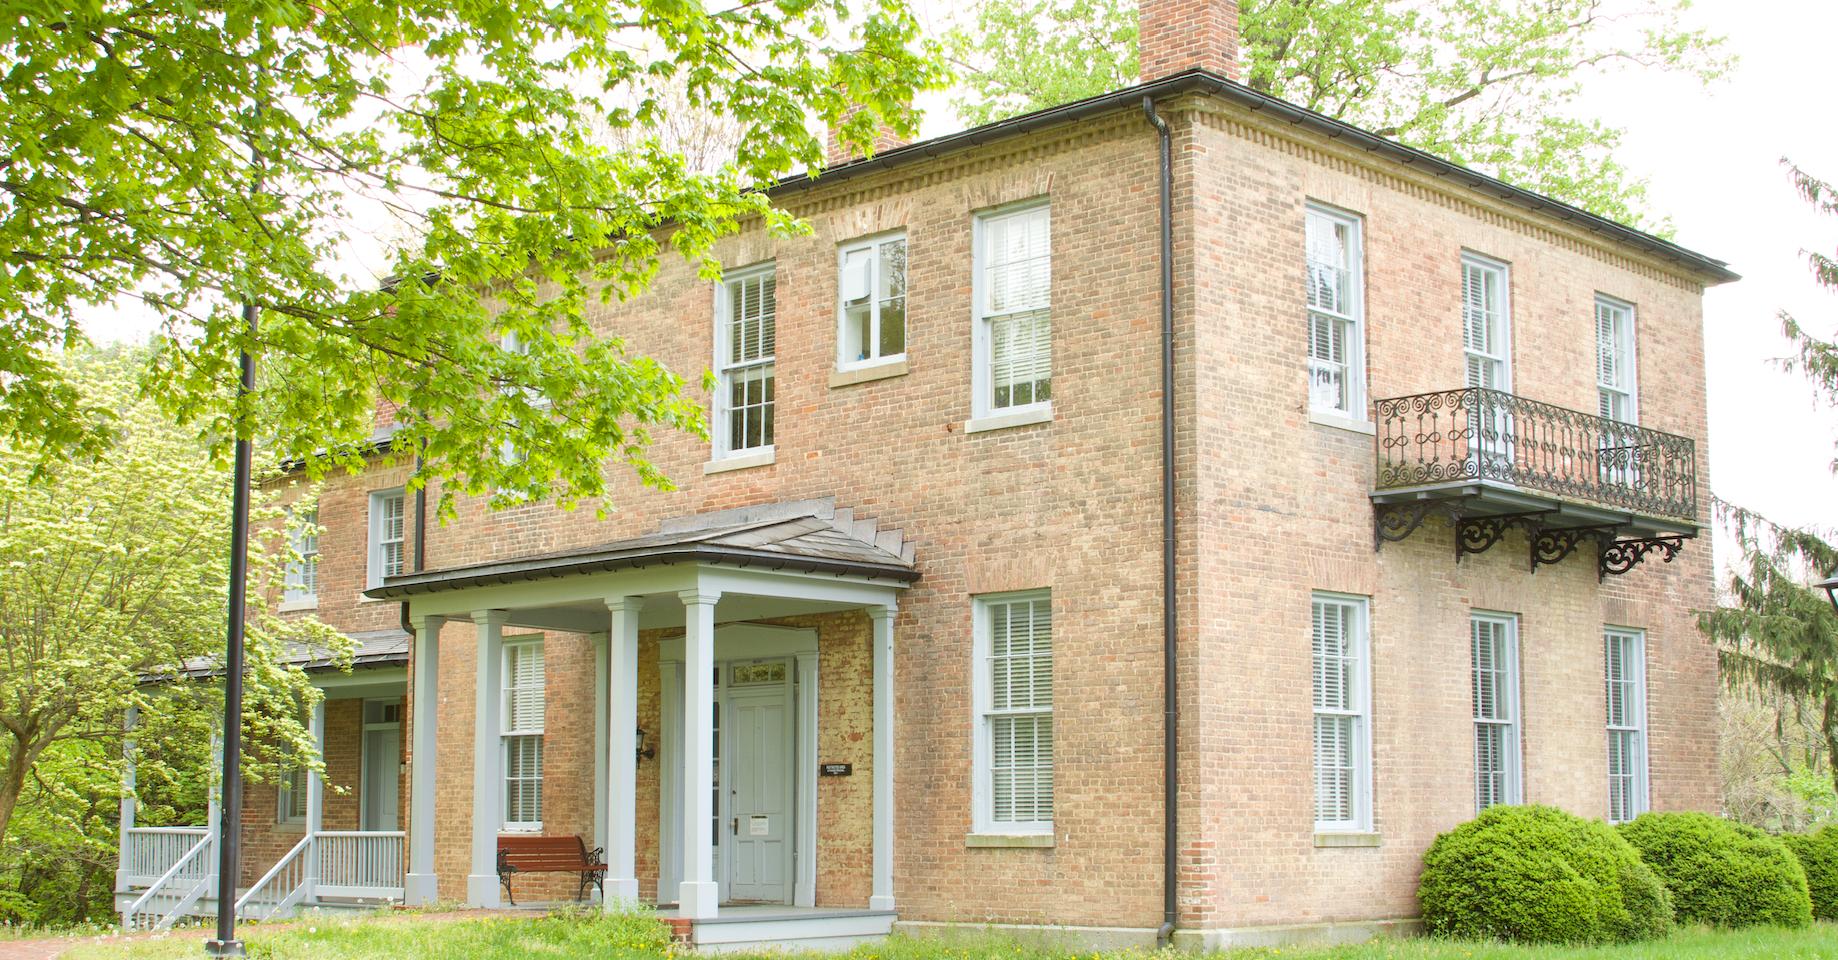 45. Morrell House   (Photo by G. Maurice Ballard)